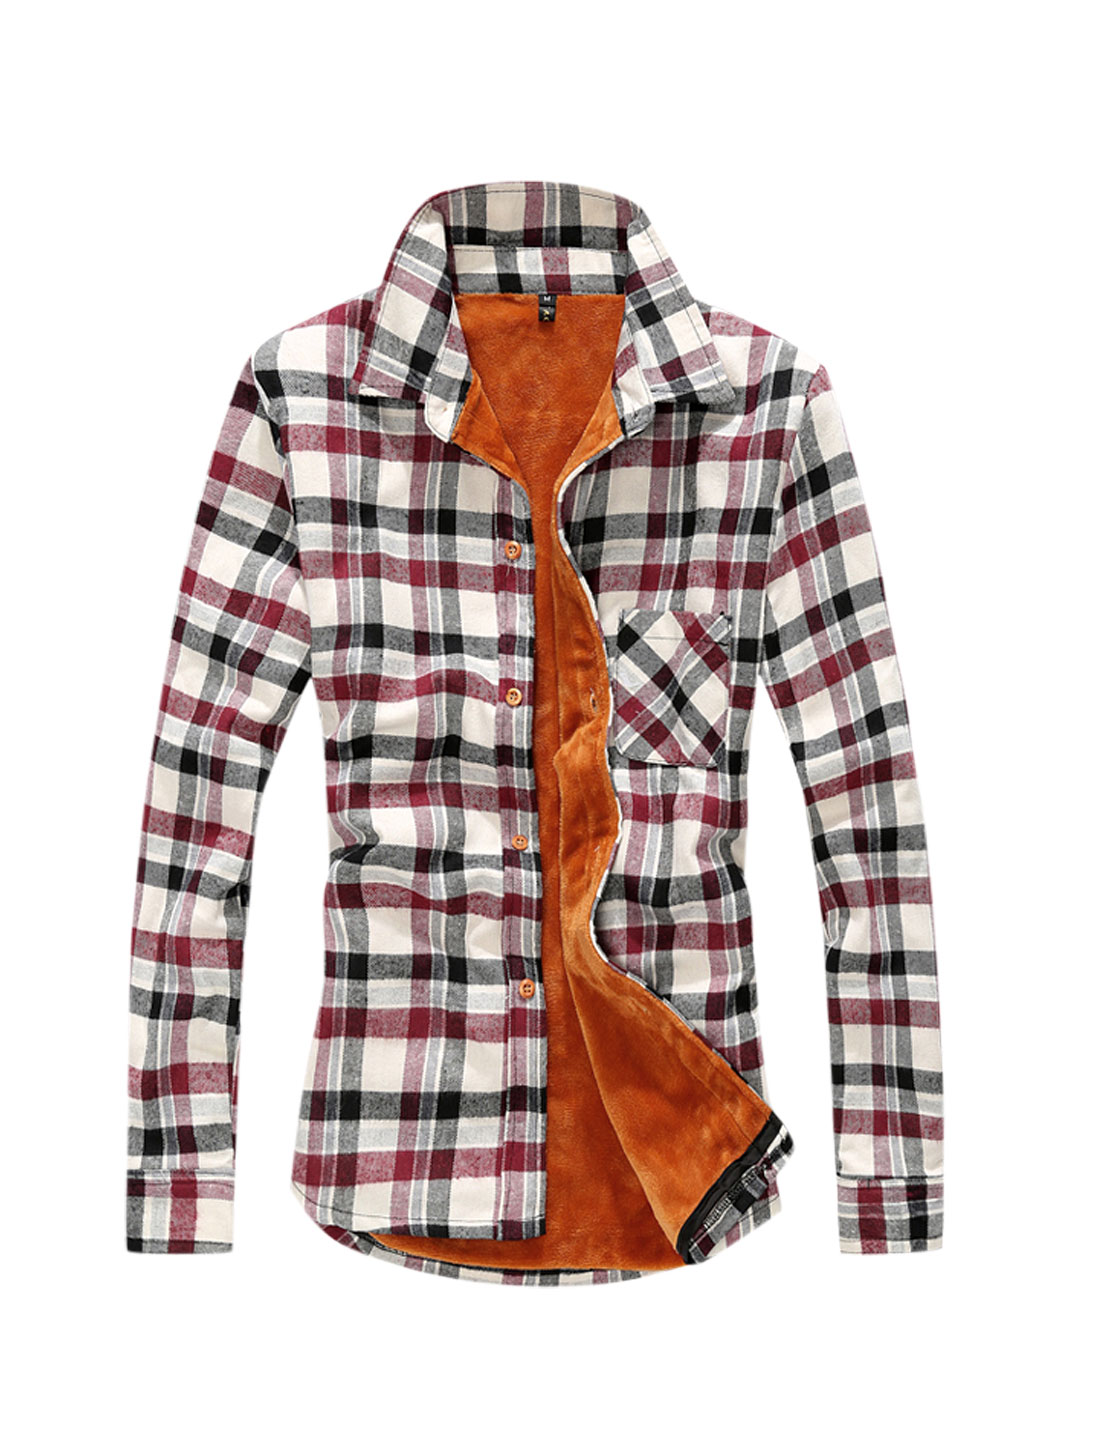 Man Burgundy Point Collar Long Sleeves Plaids Single Breasted Bodywarmer Shirt M